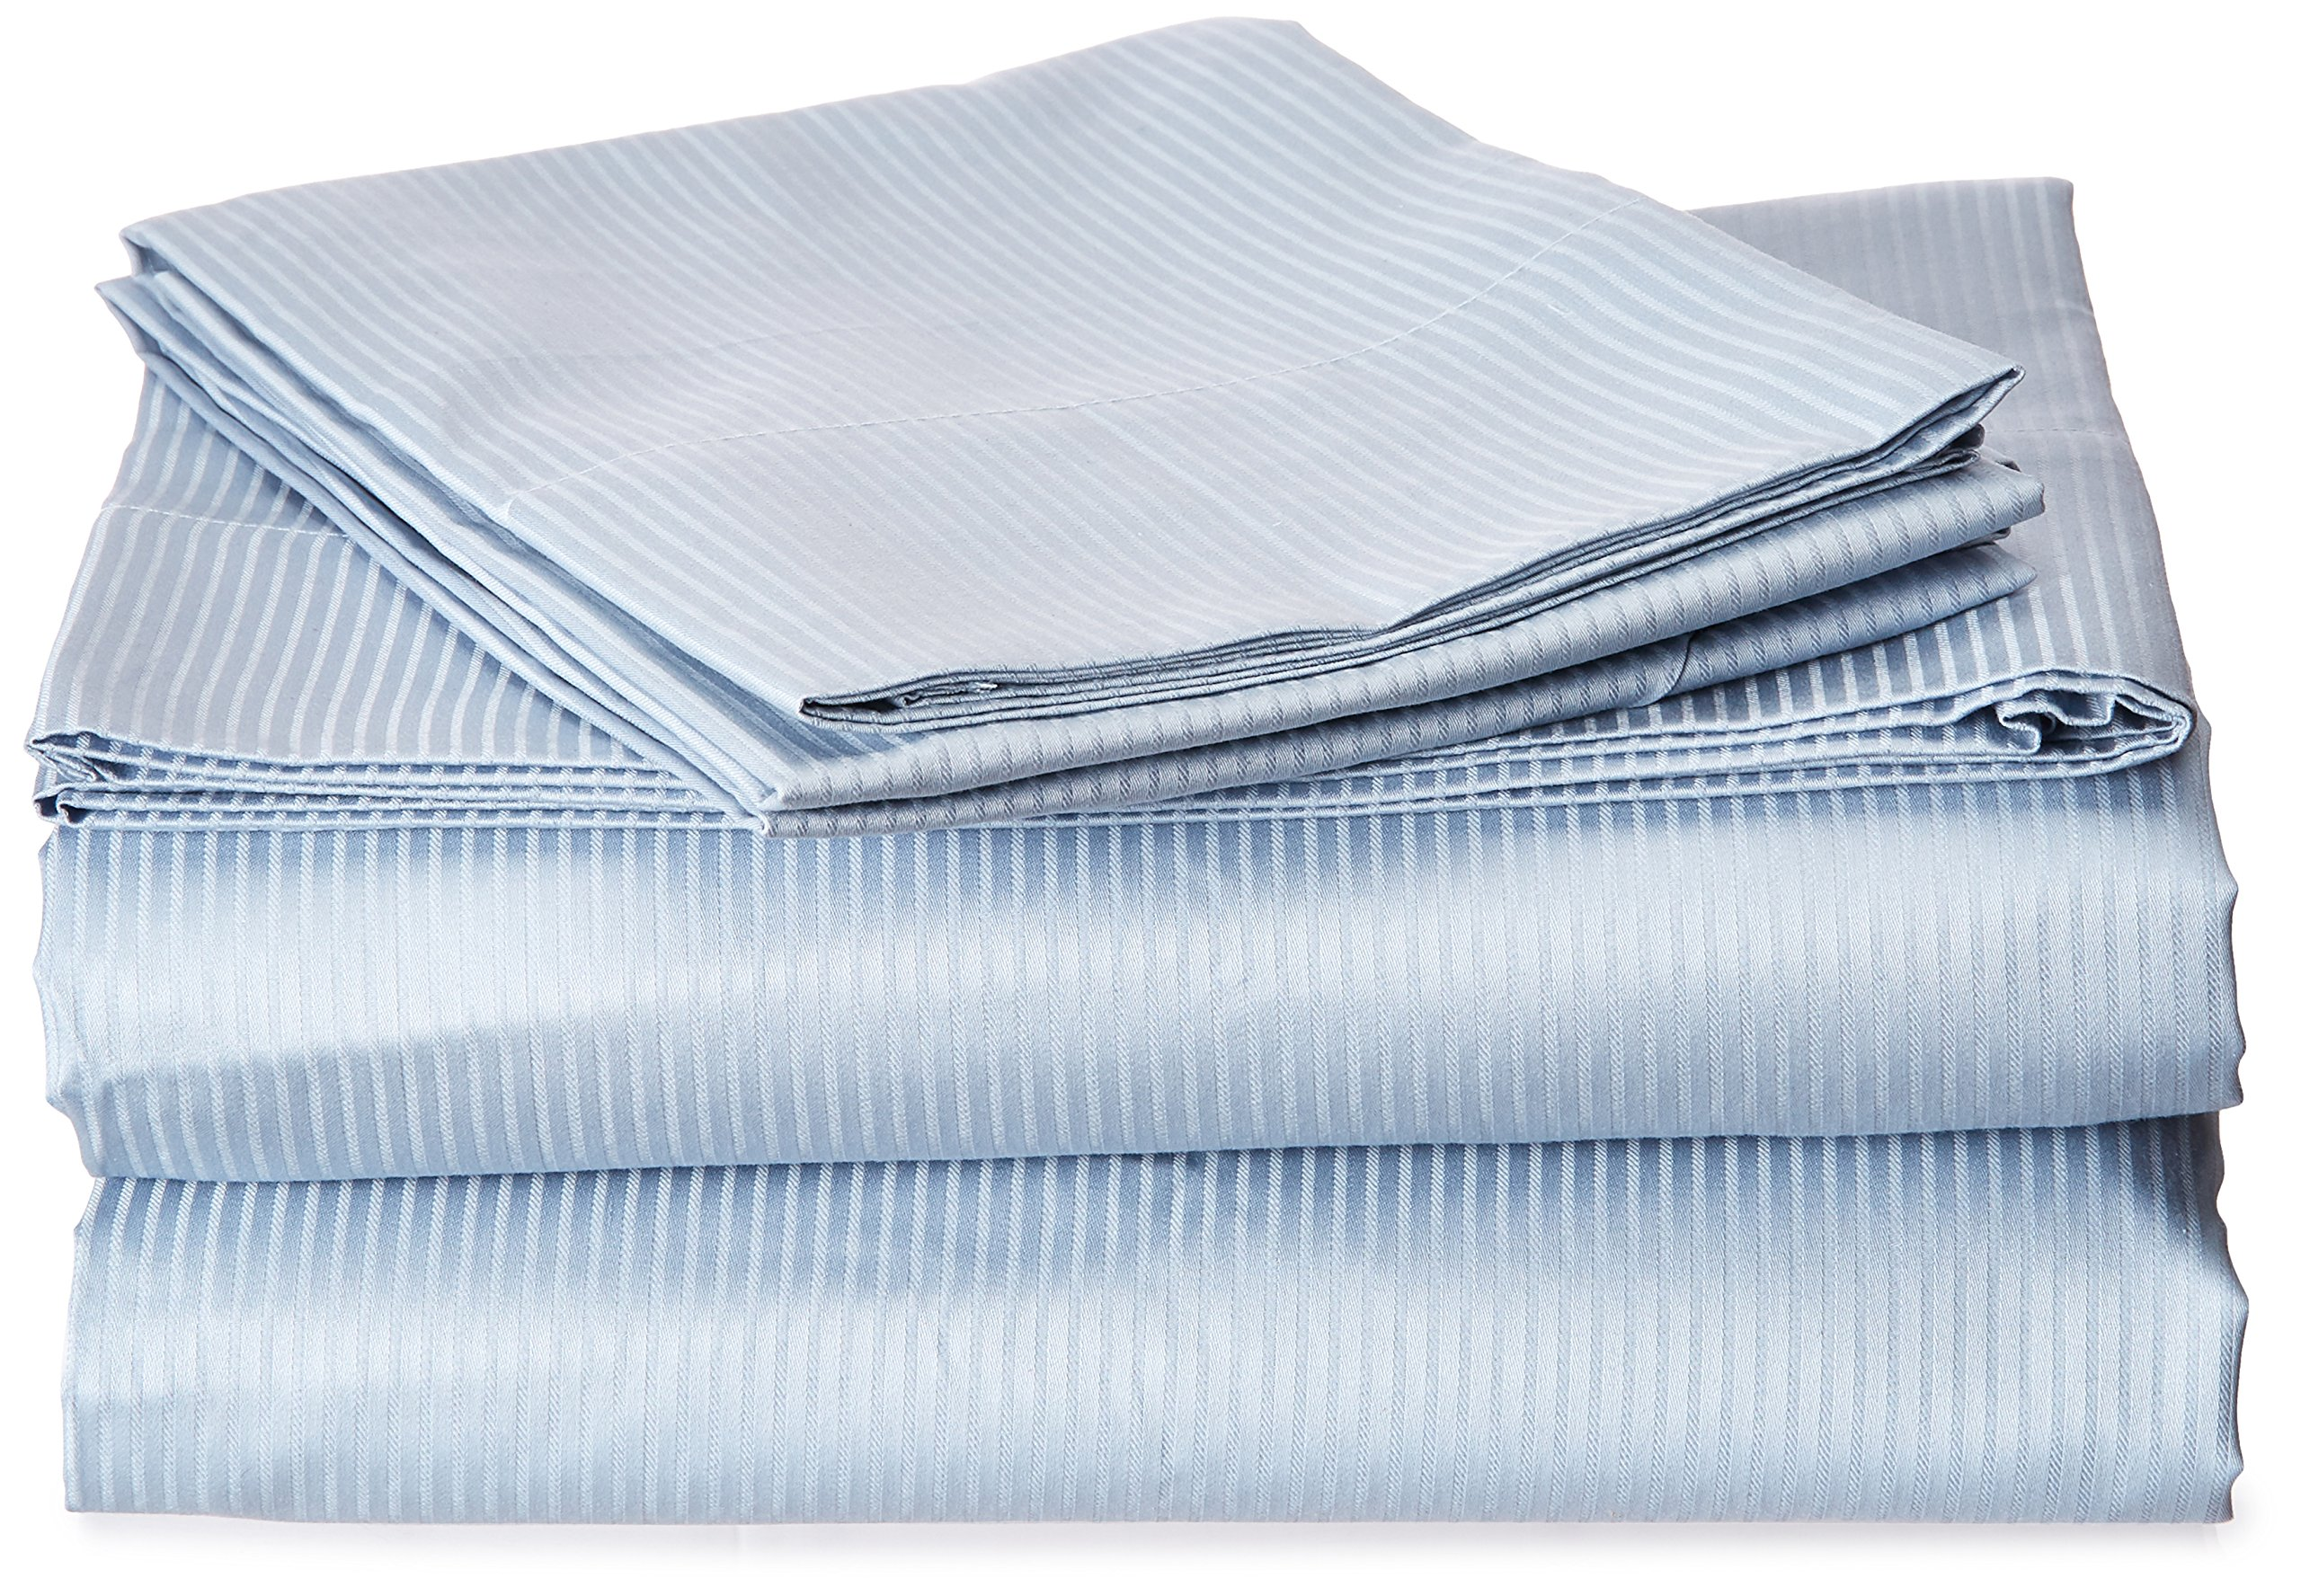 Natural Comfort Premier Hotel Select Sheet Set, Queen, Light Blue/Pinstripe